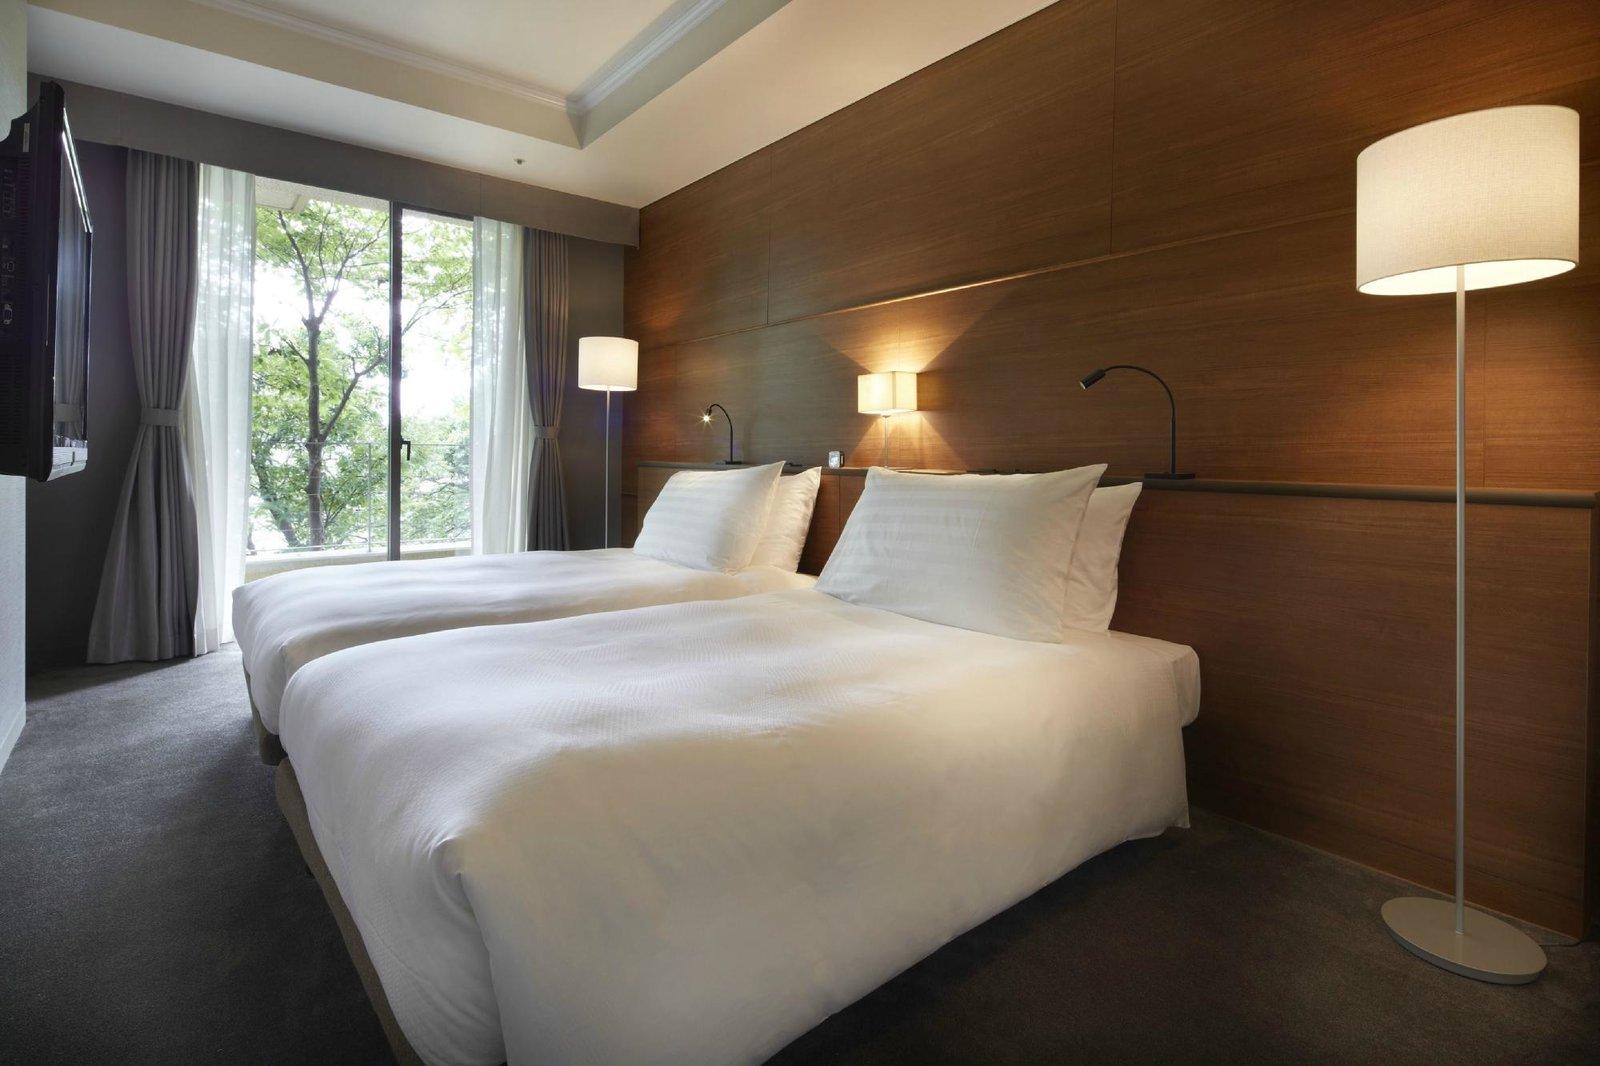 Bedroom, Carpet Floor, Bed, Floor Lighting, and Table Lighting  Best Photos from Agora Fukuoka Hilltop Hotel & Spa